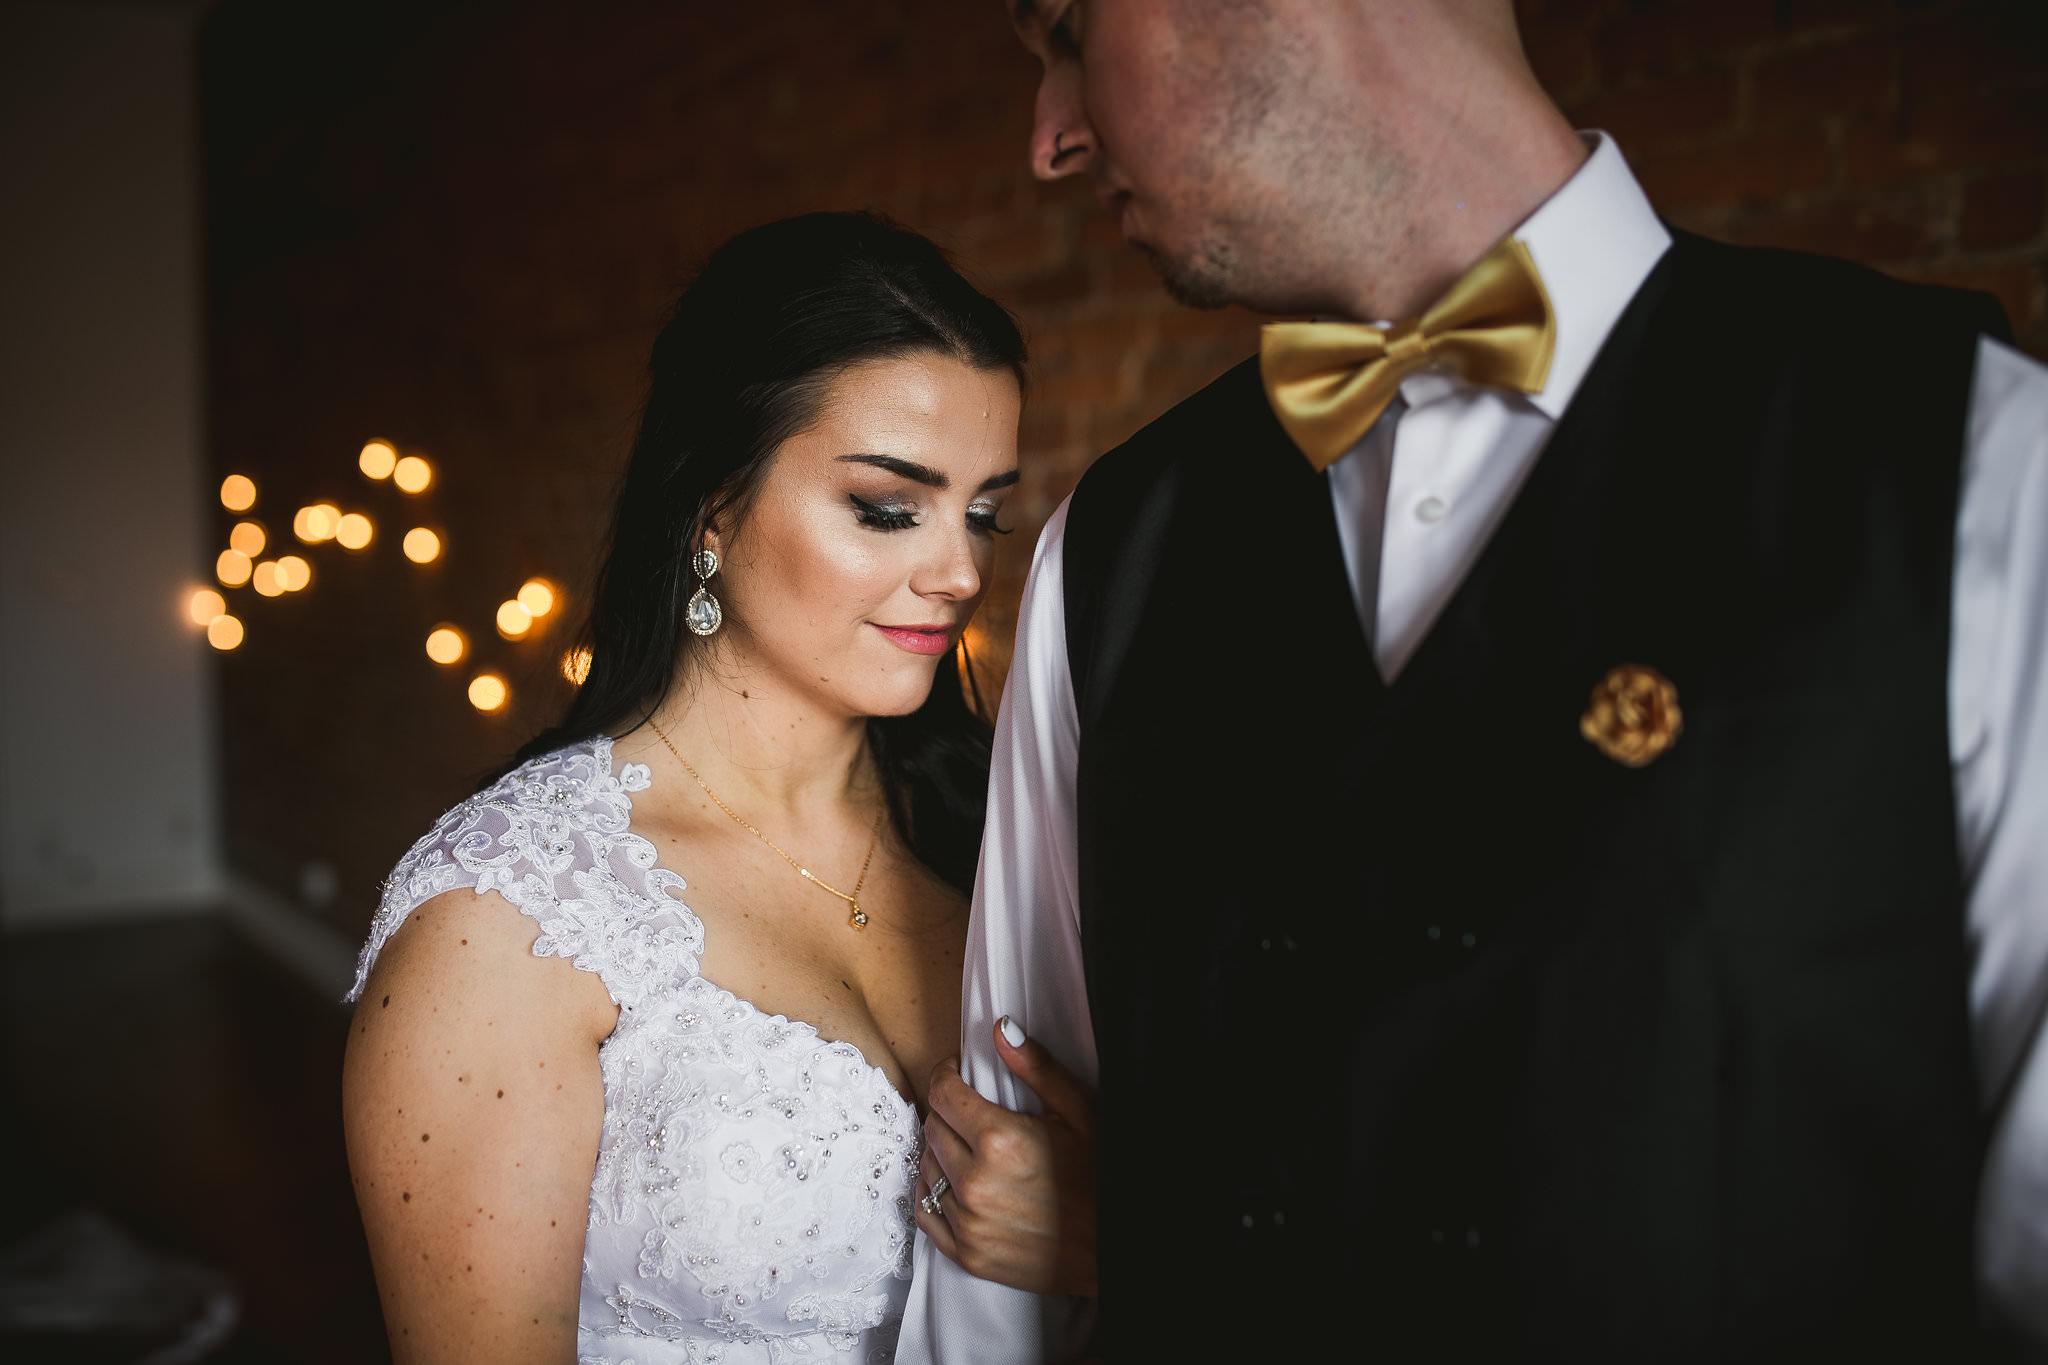 Durham Wedding Photographer: Kindred Loft Wedding Photos